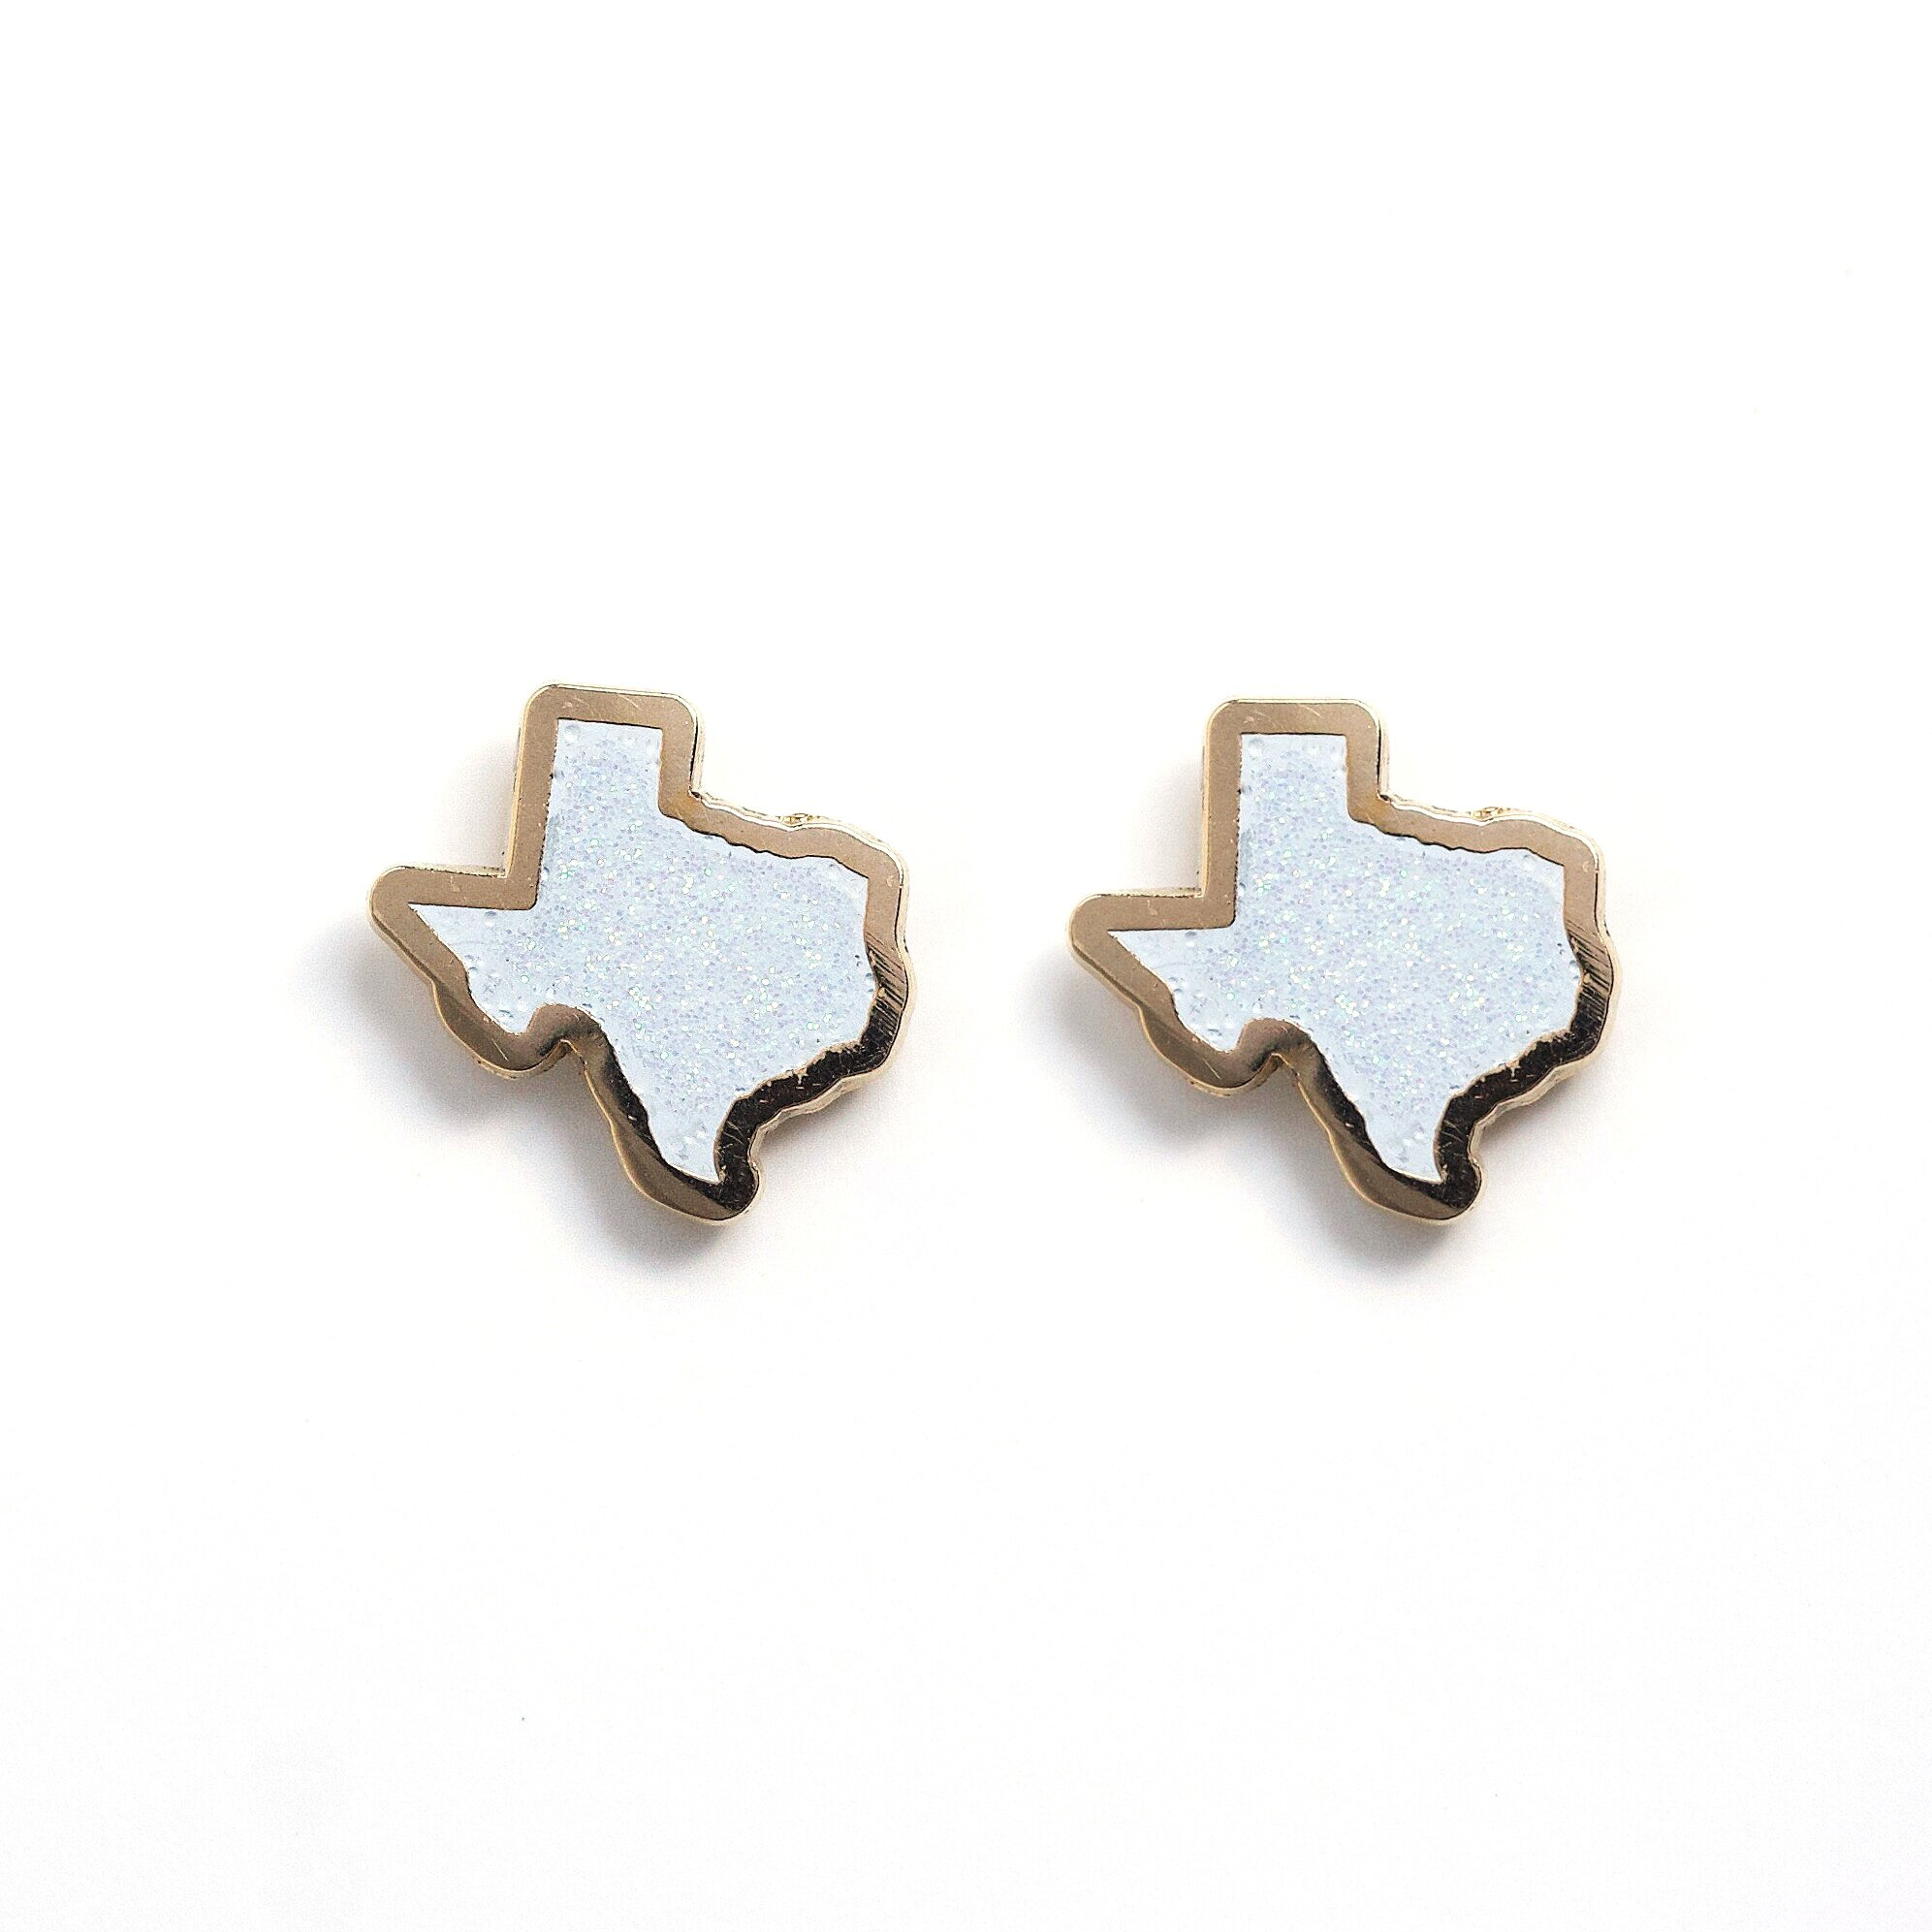 E7 - Glitter Texas Earrings